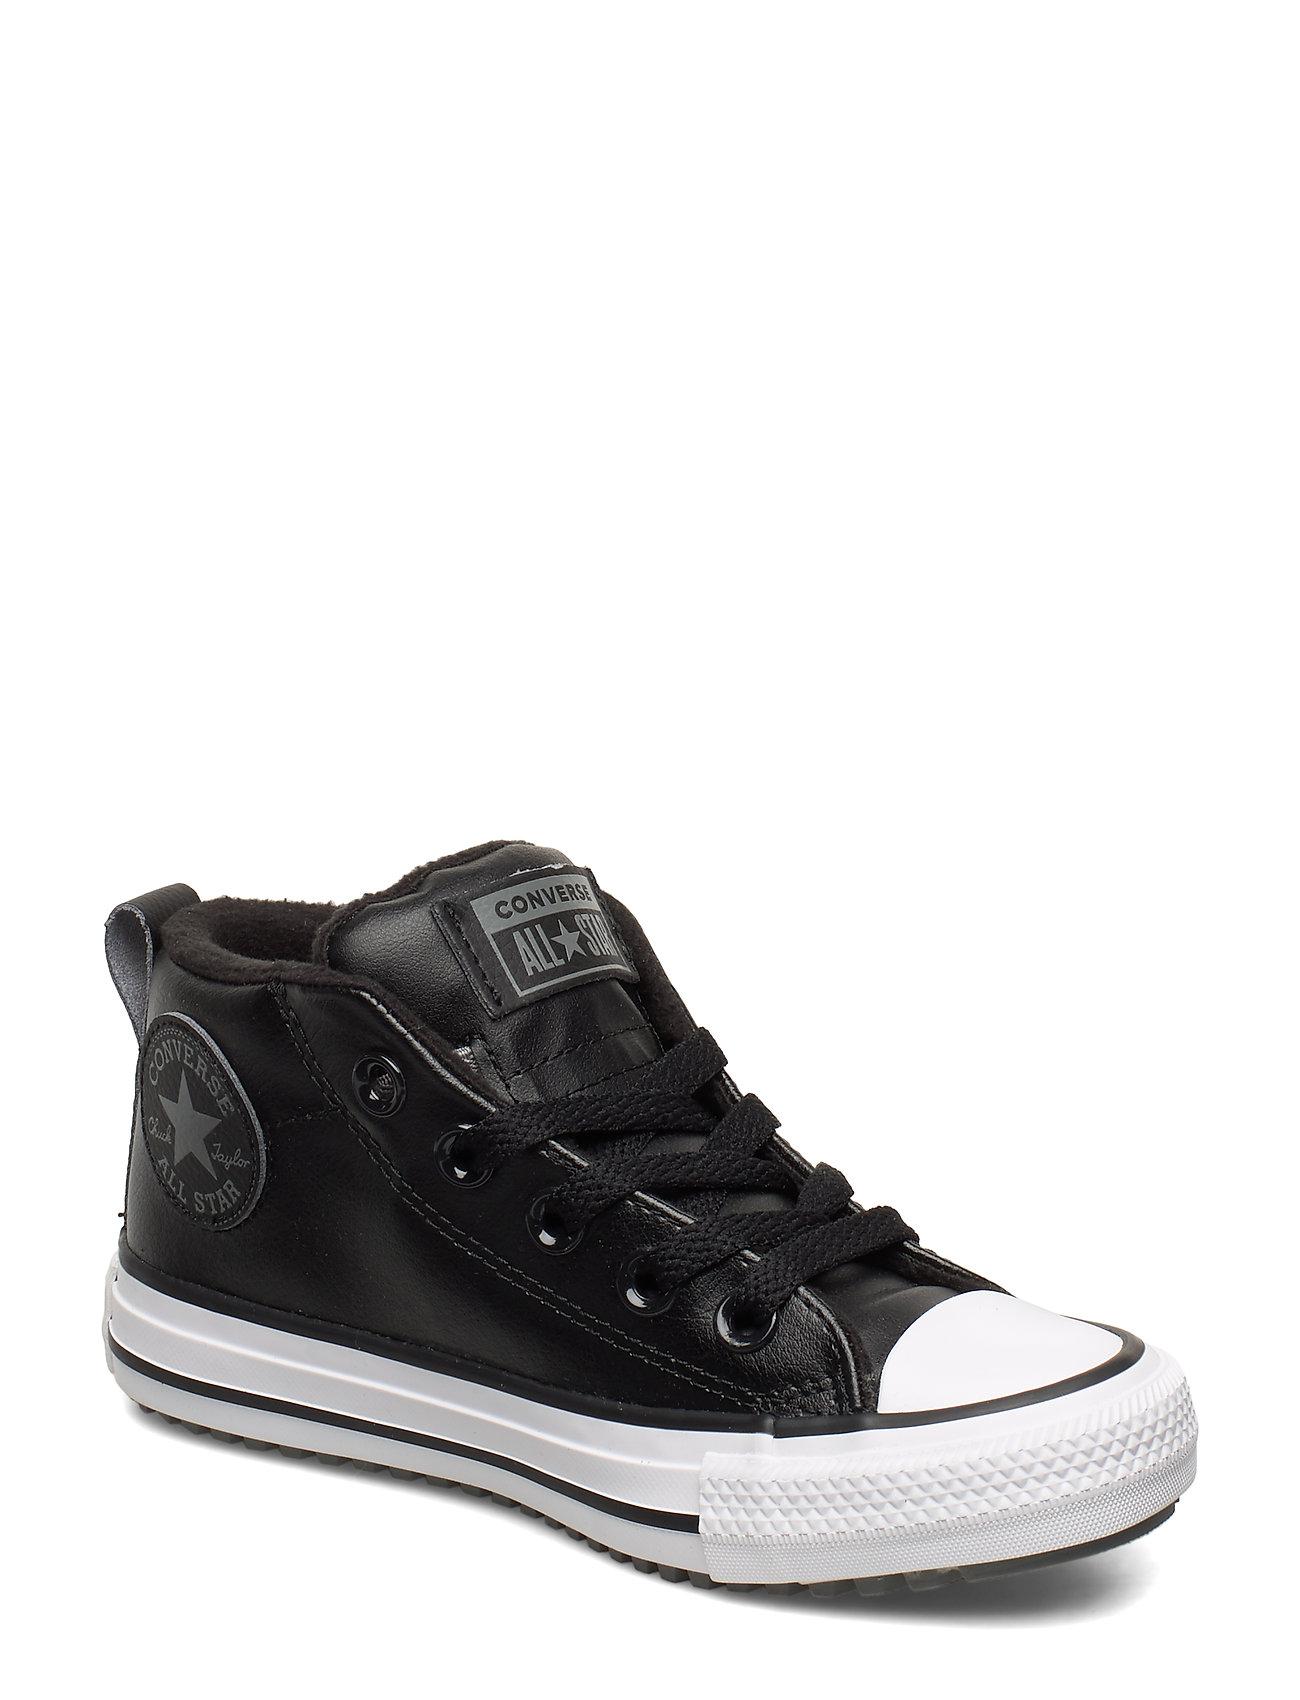 Converse CHUCK TAYLOR ALL STAR STREET BOOT - MID - BLACK